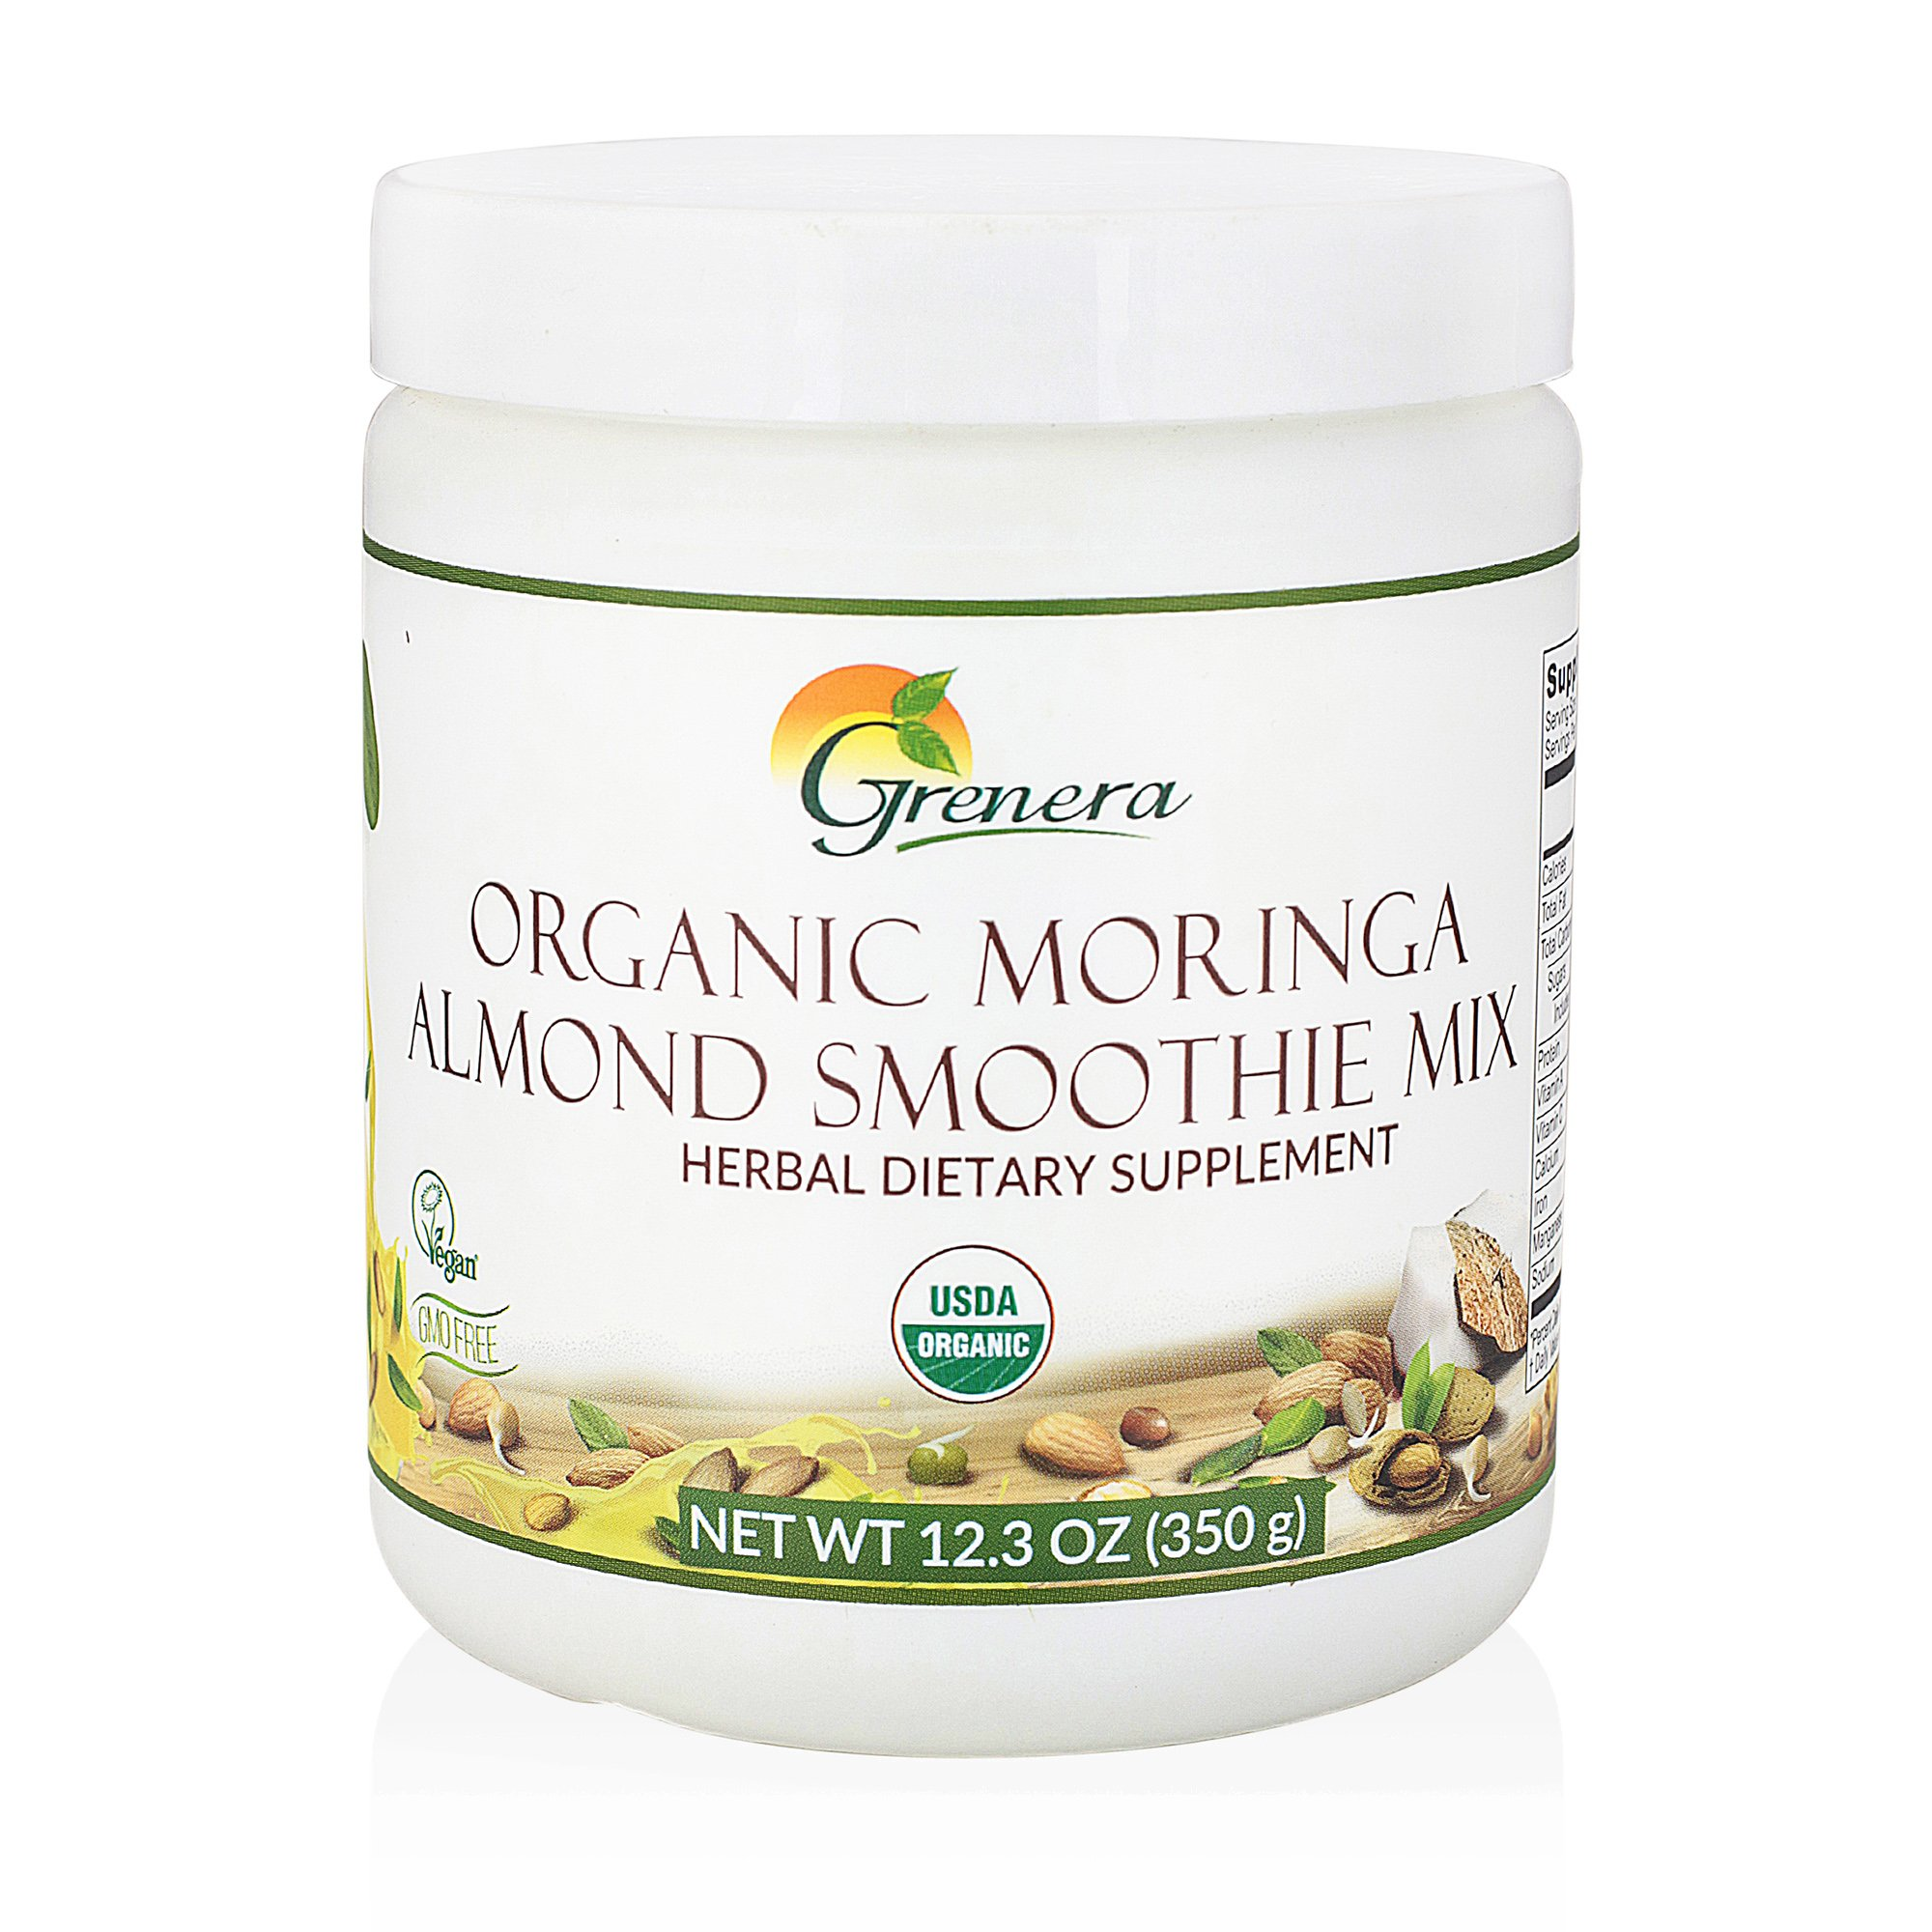 Grenera Organic Moringa Almond Smoothie Mix - 12.3 Ounce / 350 g - USDA Organic , Vegan, Kosher Certified